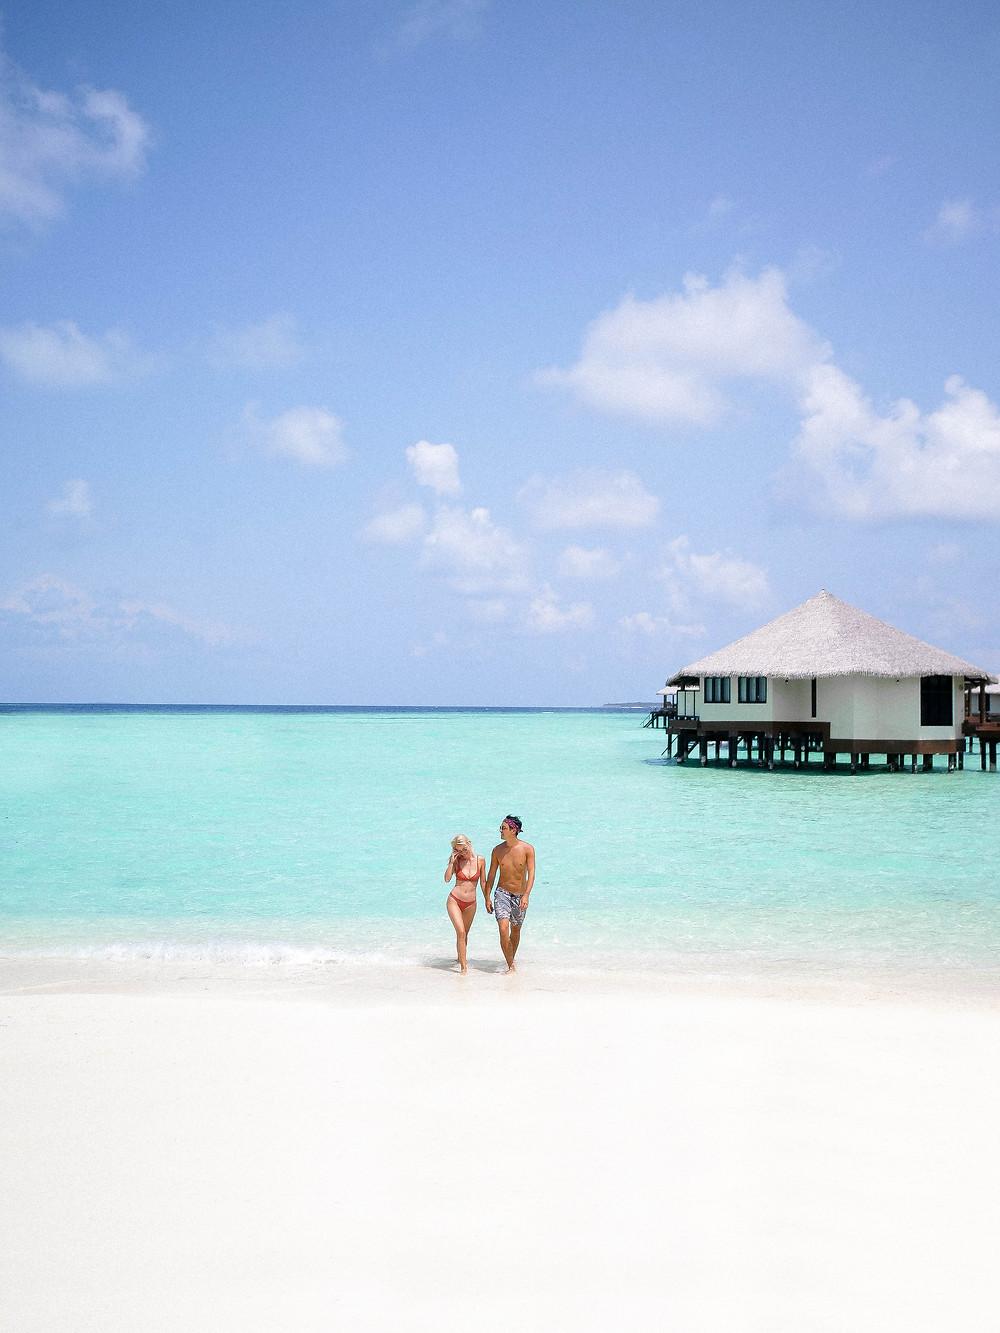 Kihaa Resort Maldives